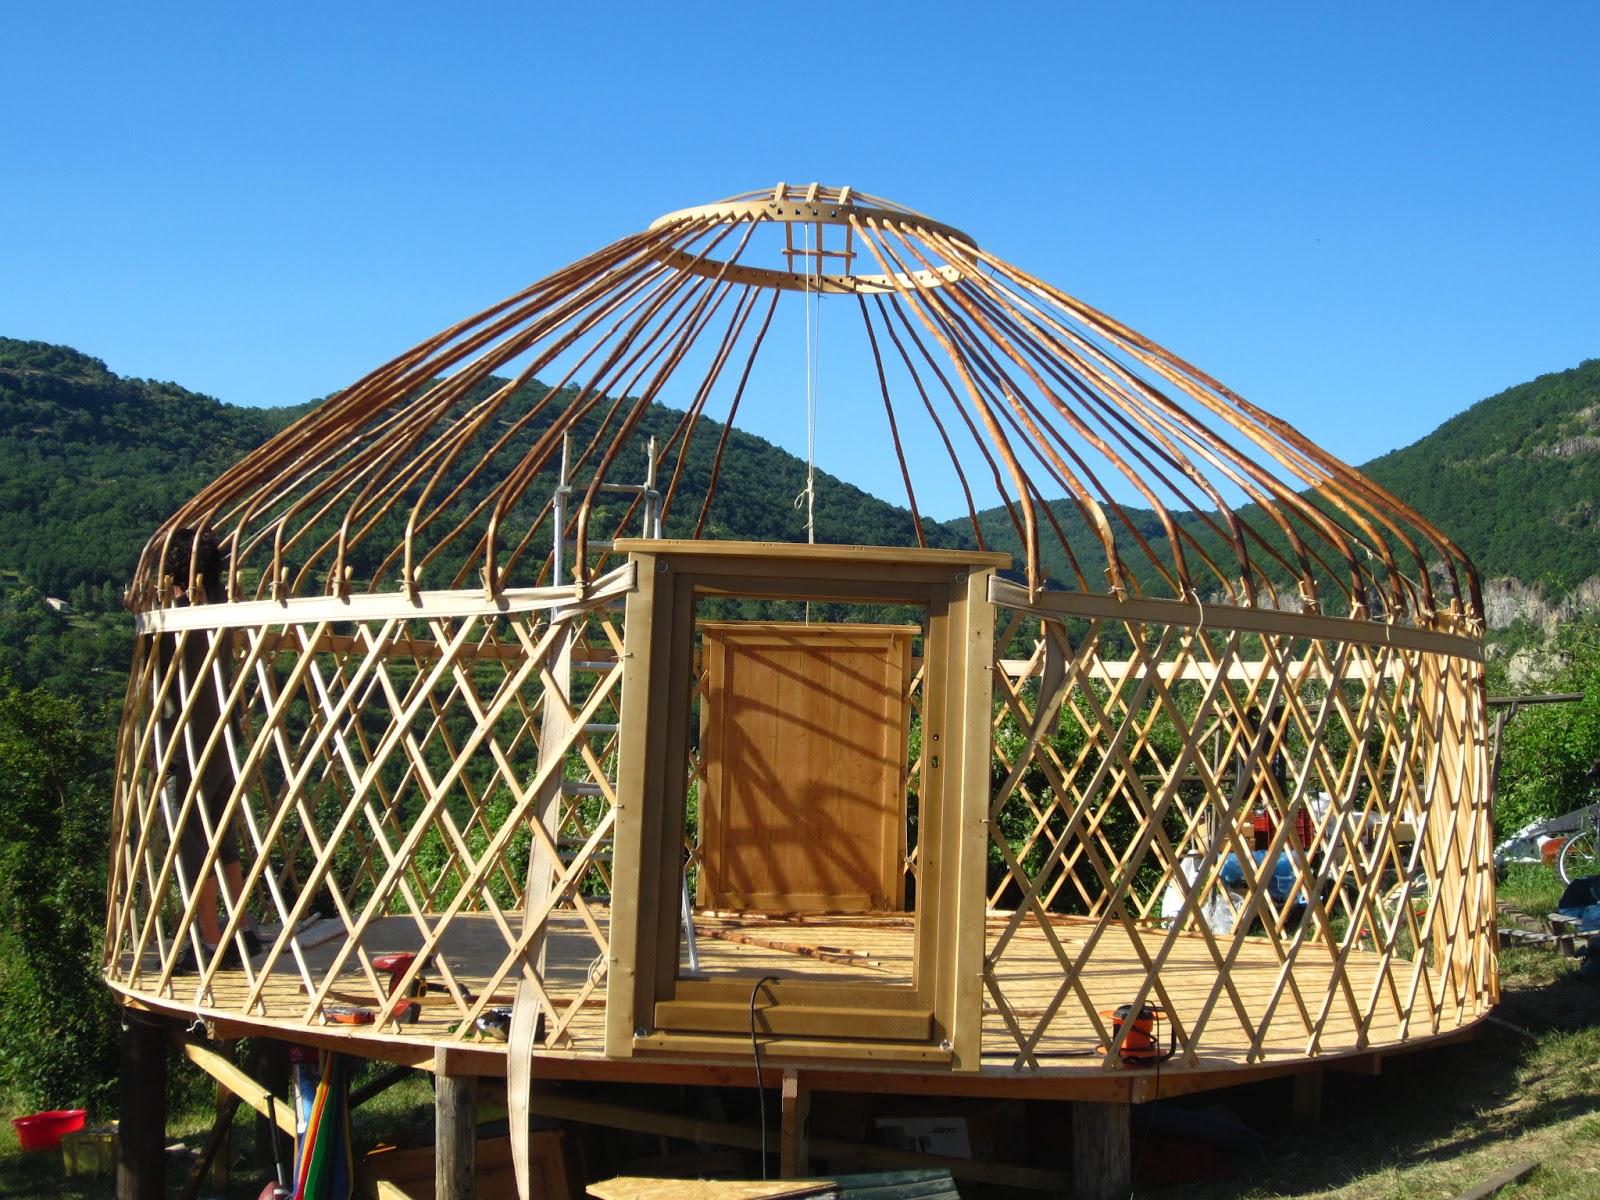 l 39 atelier des coureurs des bois tente en bois darbres nom du village. Black Bedroom Furniture Sets. Home Design Ideas